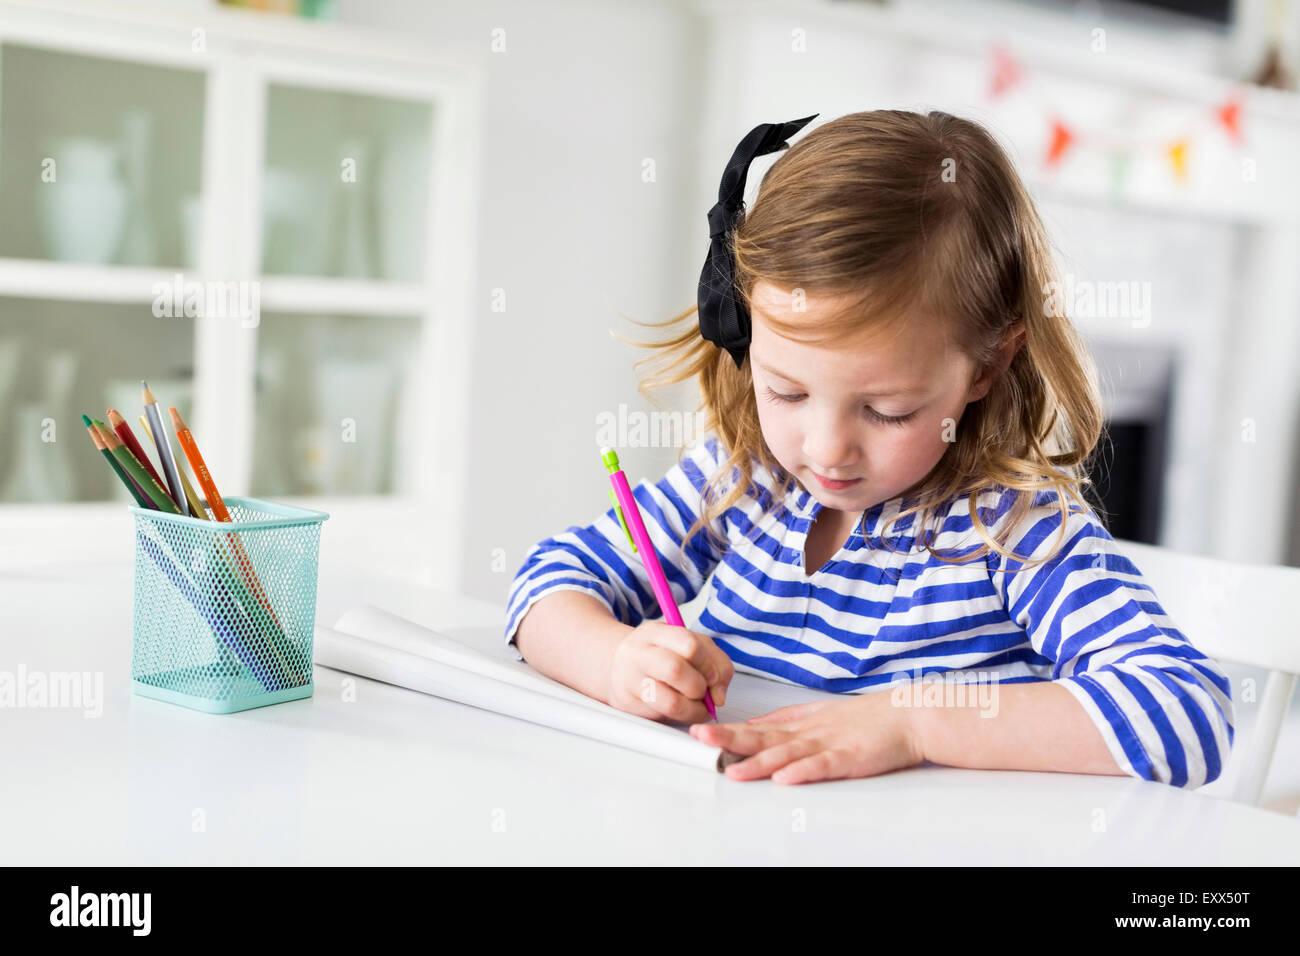 Chica (4-5) en la sala de dibujo Imagen De Stock